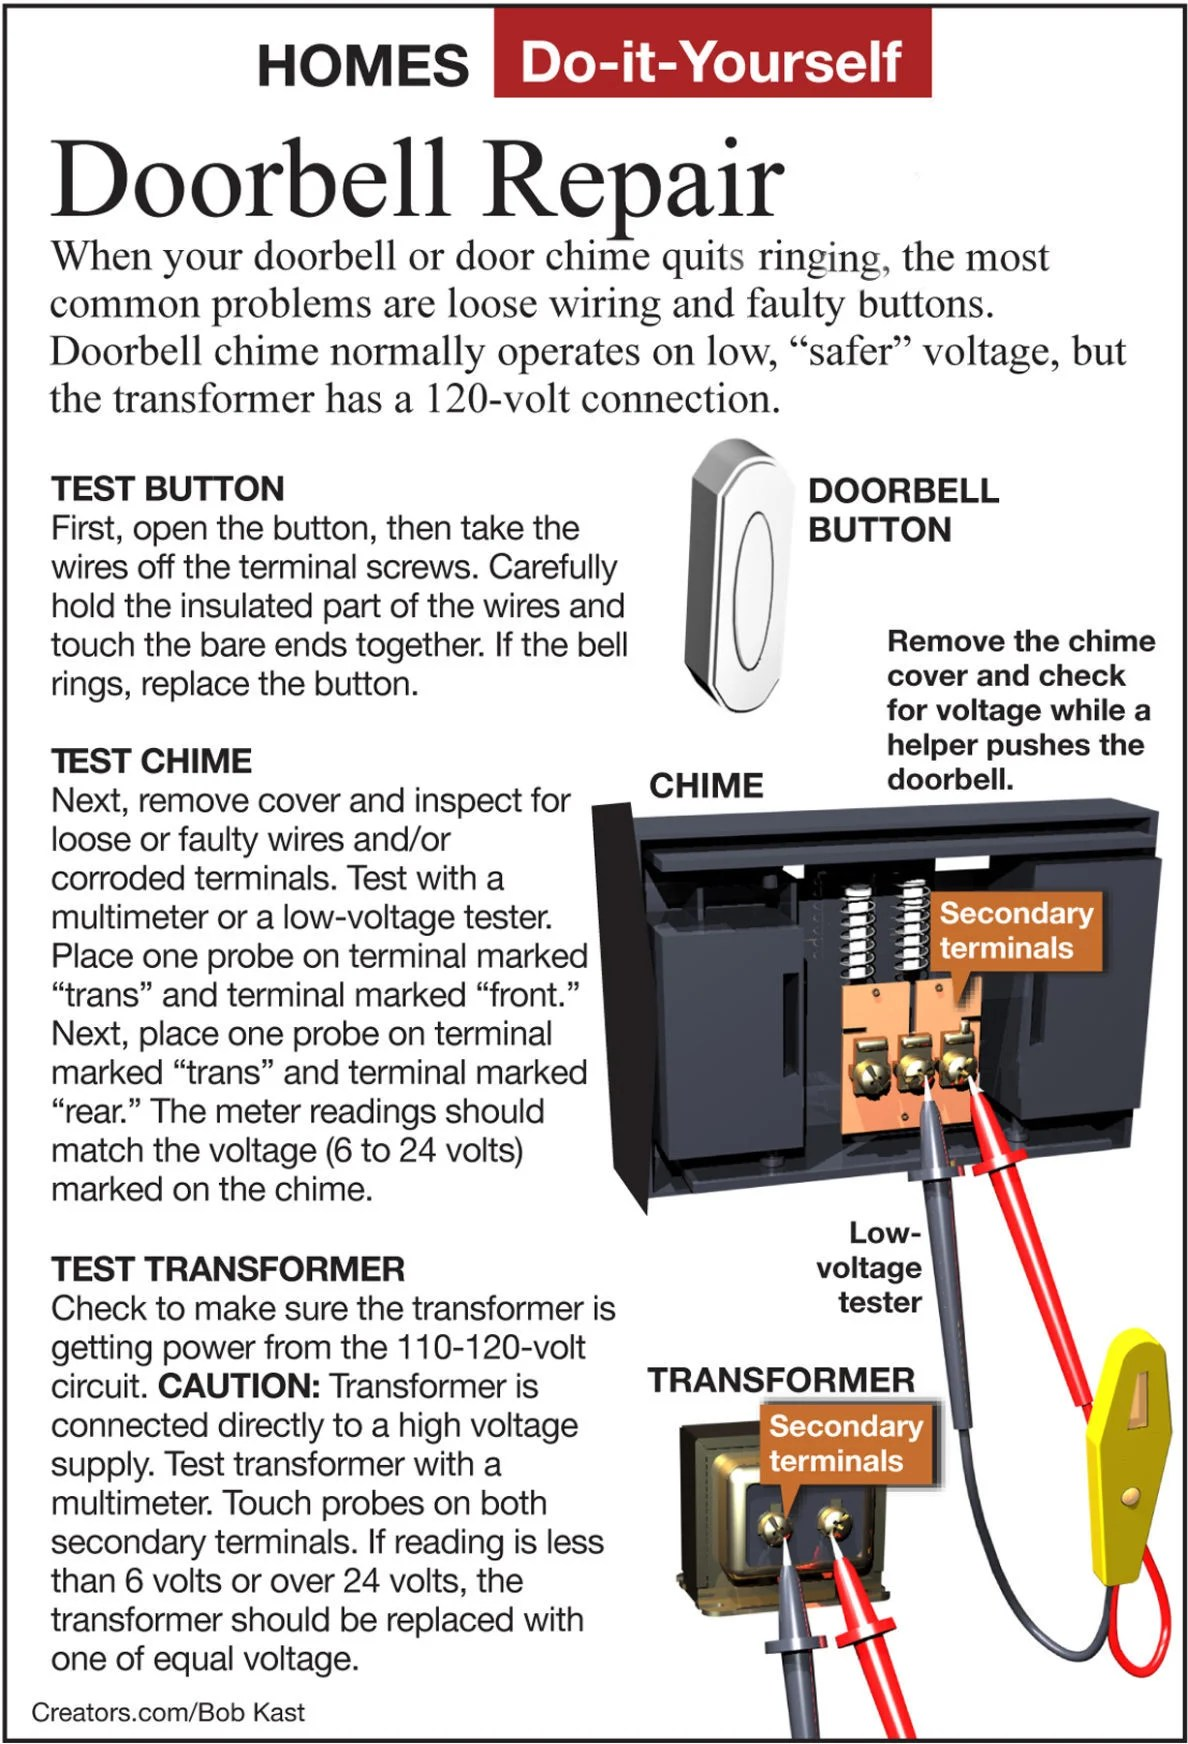 Latest utilitech doorbell wiring diagram home theatre wiring diagram fasco doorbell wiring diagram on fasco download free download 58c6b8675e6f3 fasco doorbell wiring diagramhtml latest utilitech doorbell wiring diagram cheapraybanclubmaster Choice Image